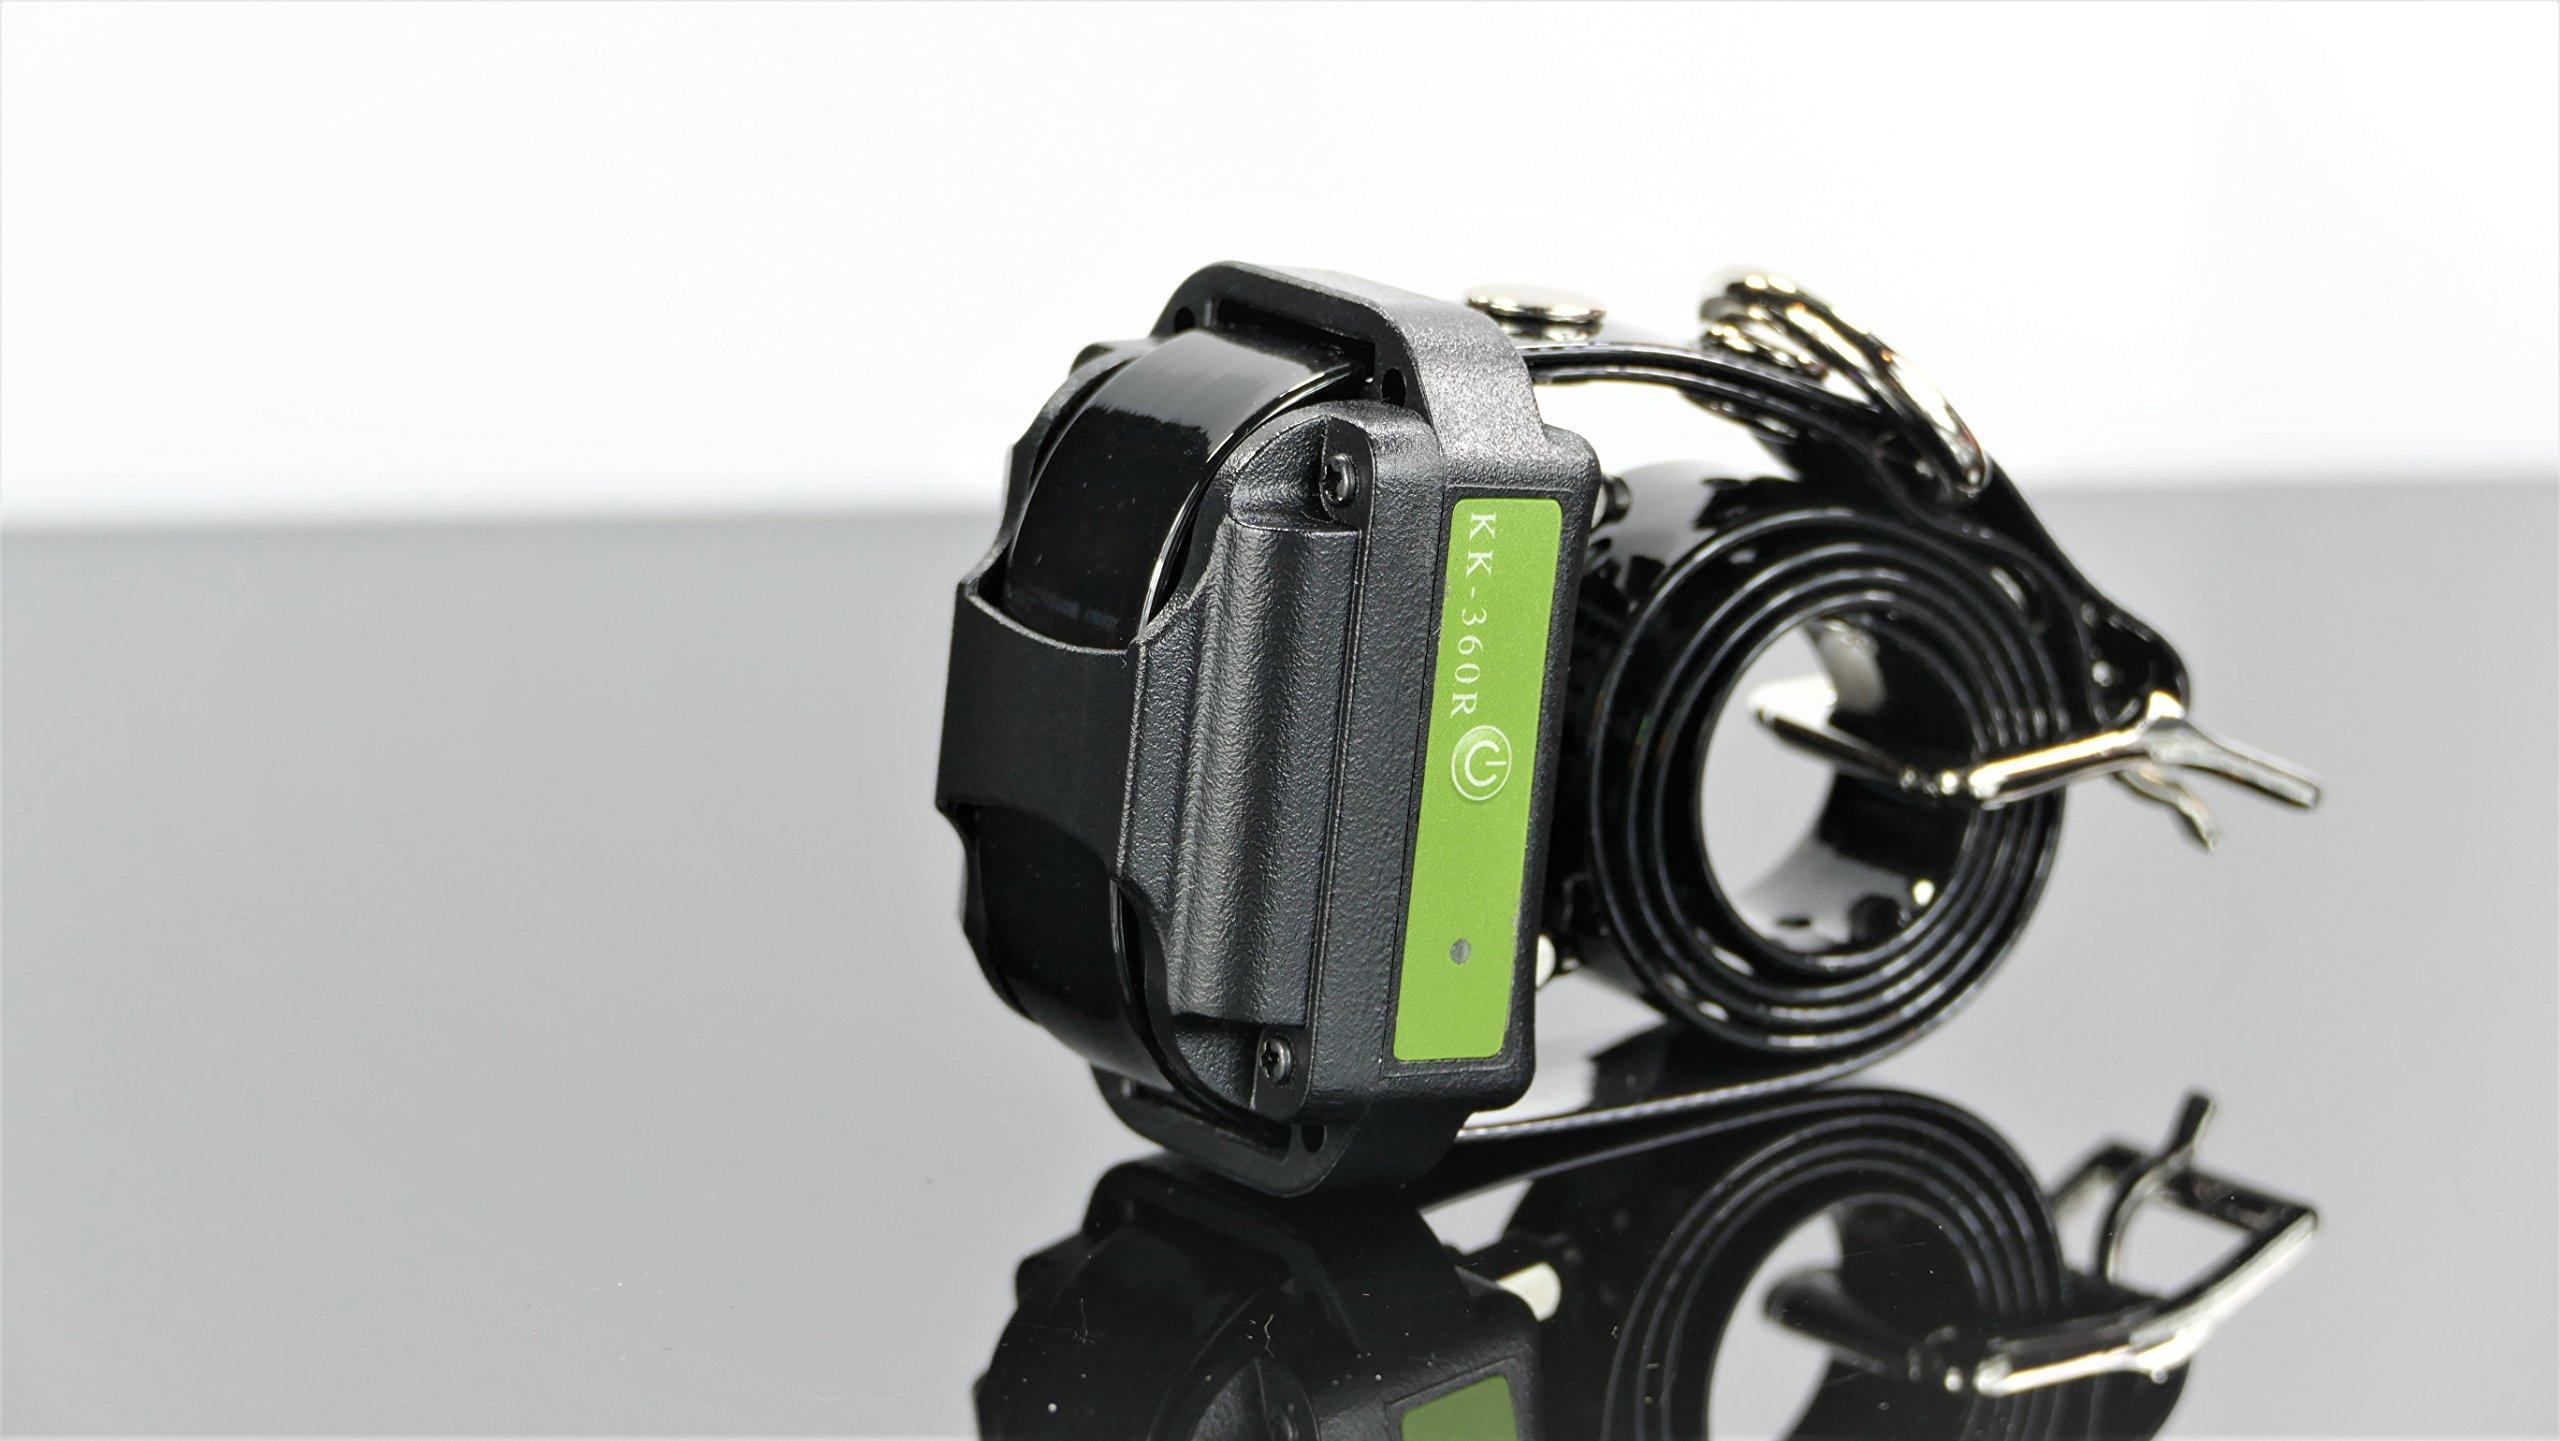 KoolKani Replacement/Spare Collar KK-360 Remote Dog Training Shock Collar System by KoolKani (Image #2)